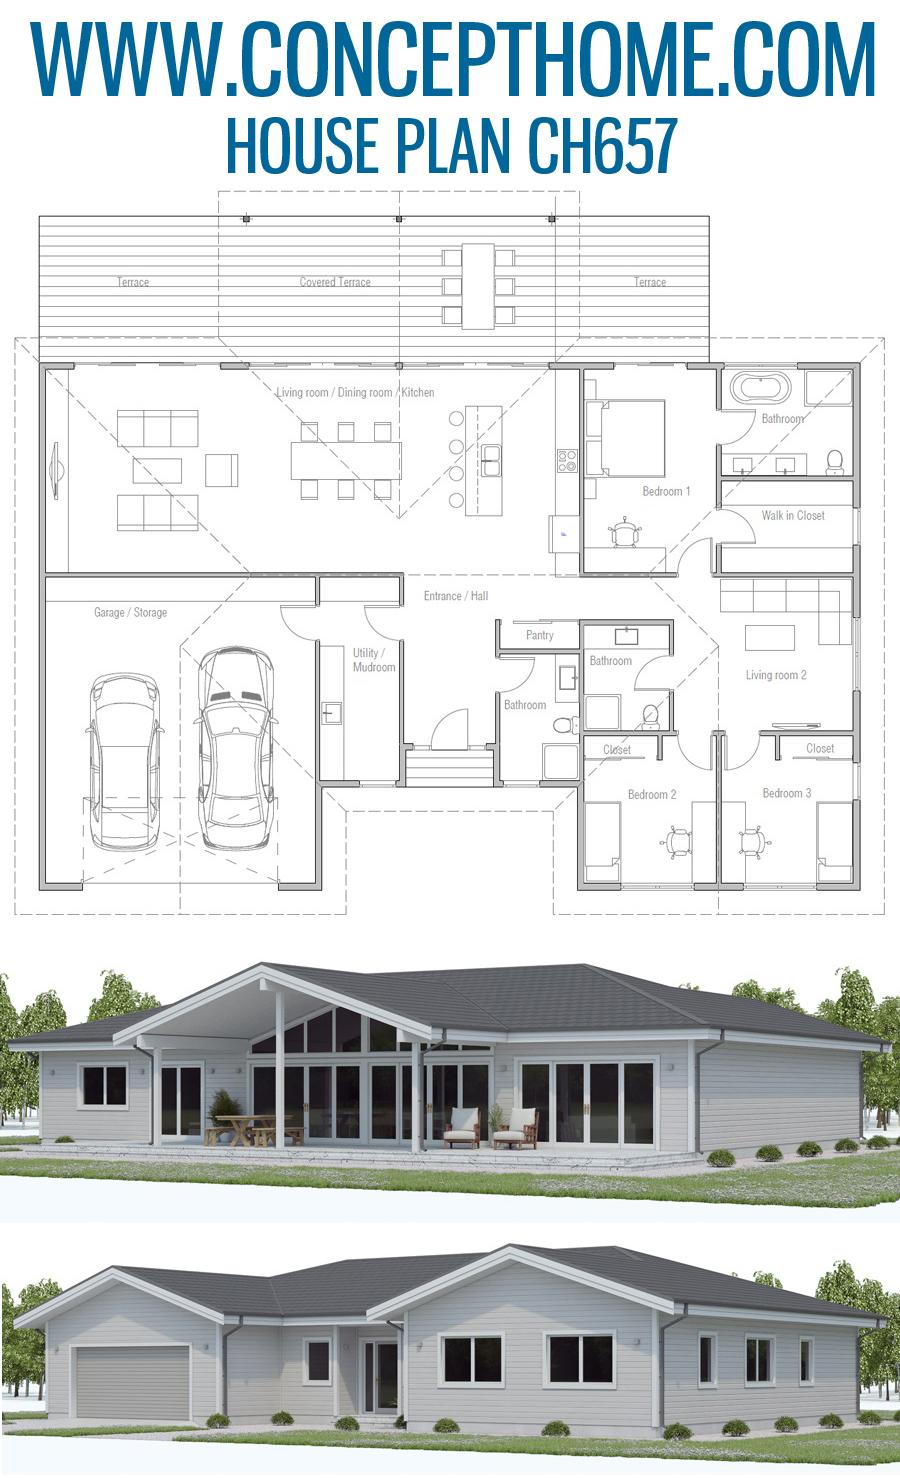 Floor Plan Ch657 House Plans Dream House Plans My House Plans